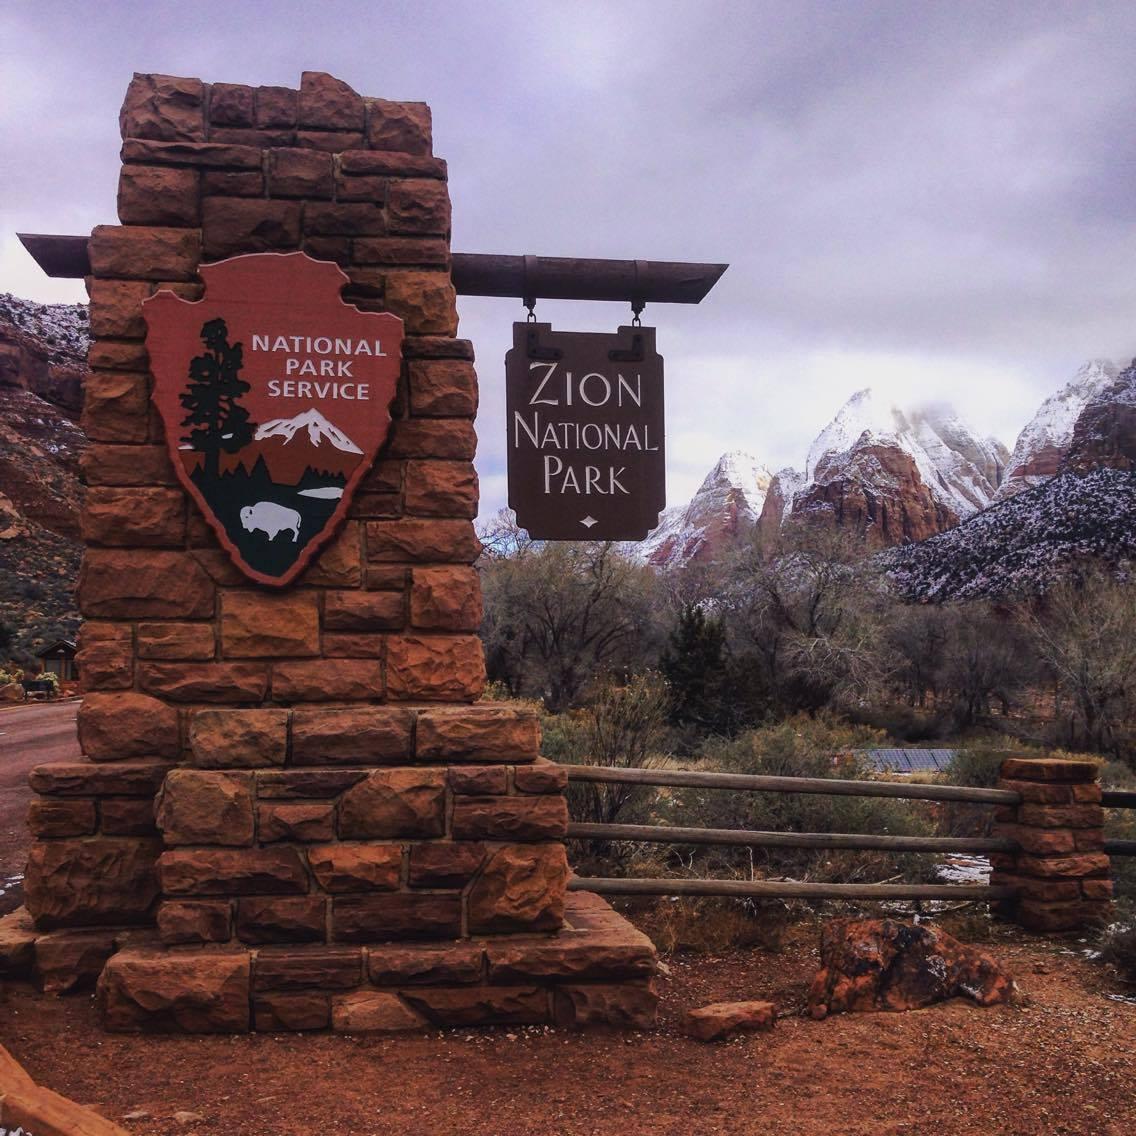 Zion National Park, Washington County, Utah, Jan. 7-8, 2016 | Photo courtesy of Melissa Gifford Lewis, St. George News